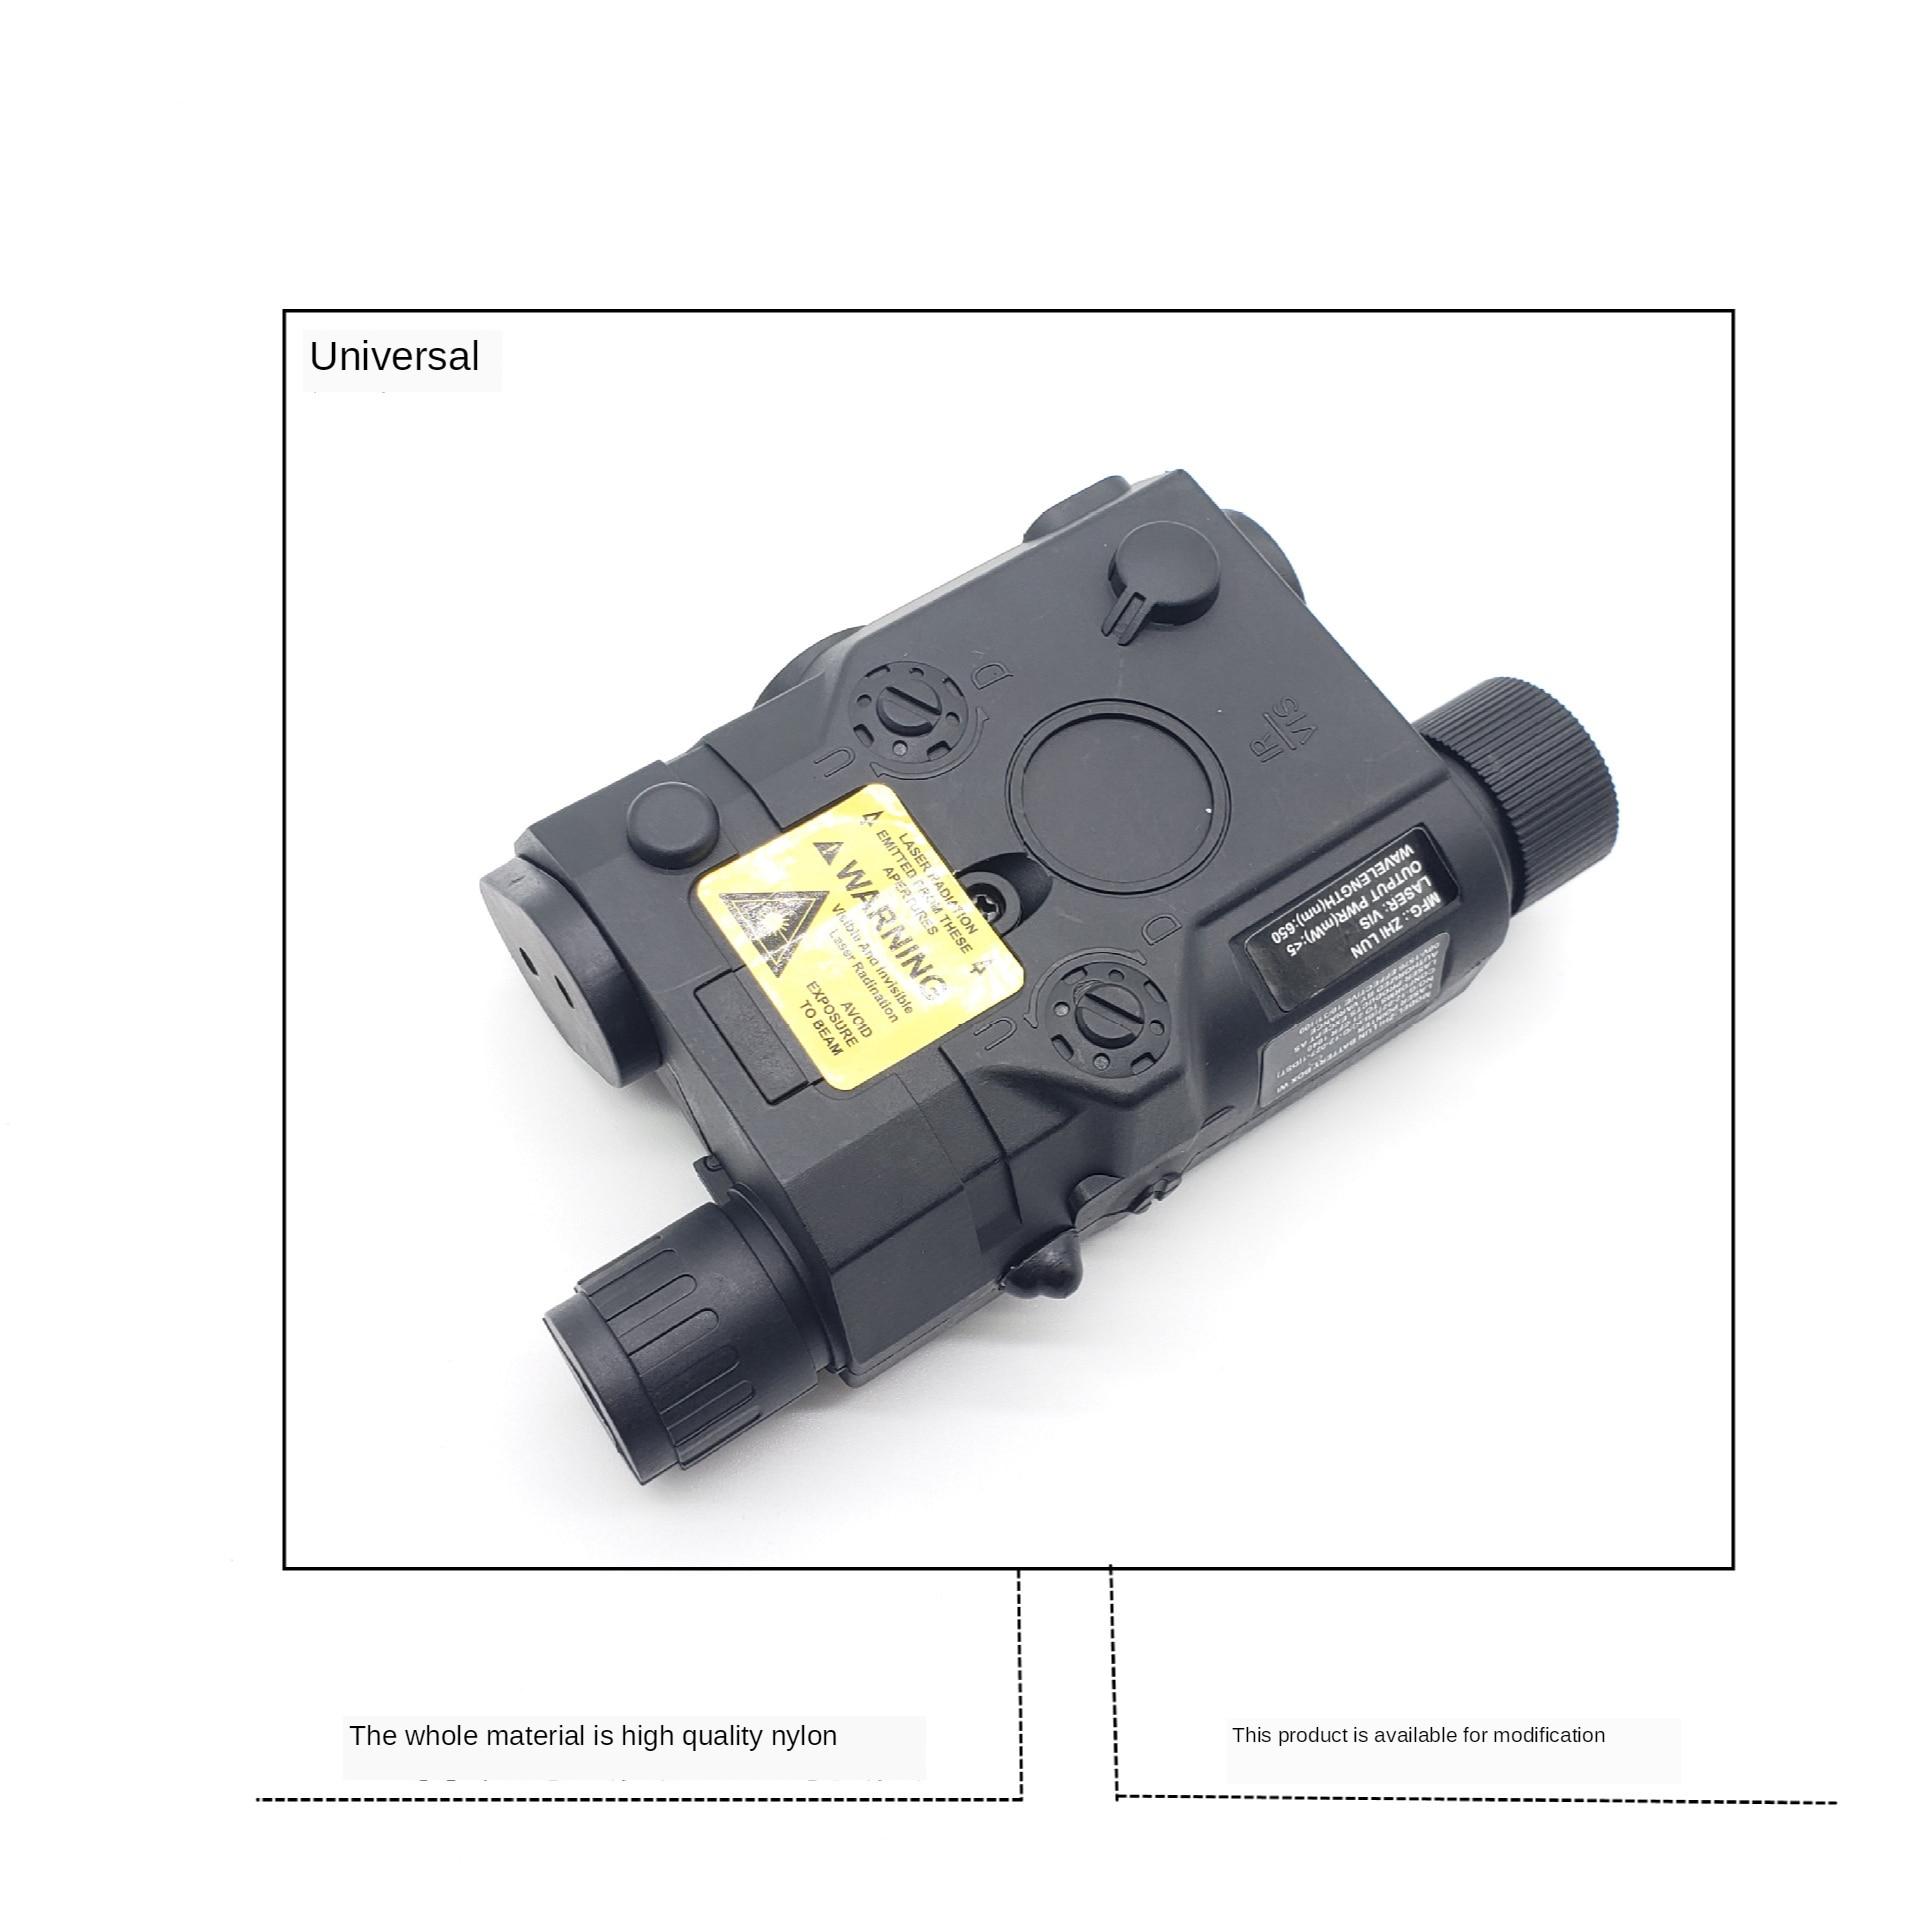 Bateria tática peq 15 bateria caso titular